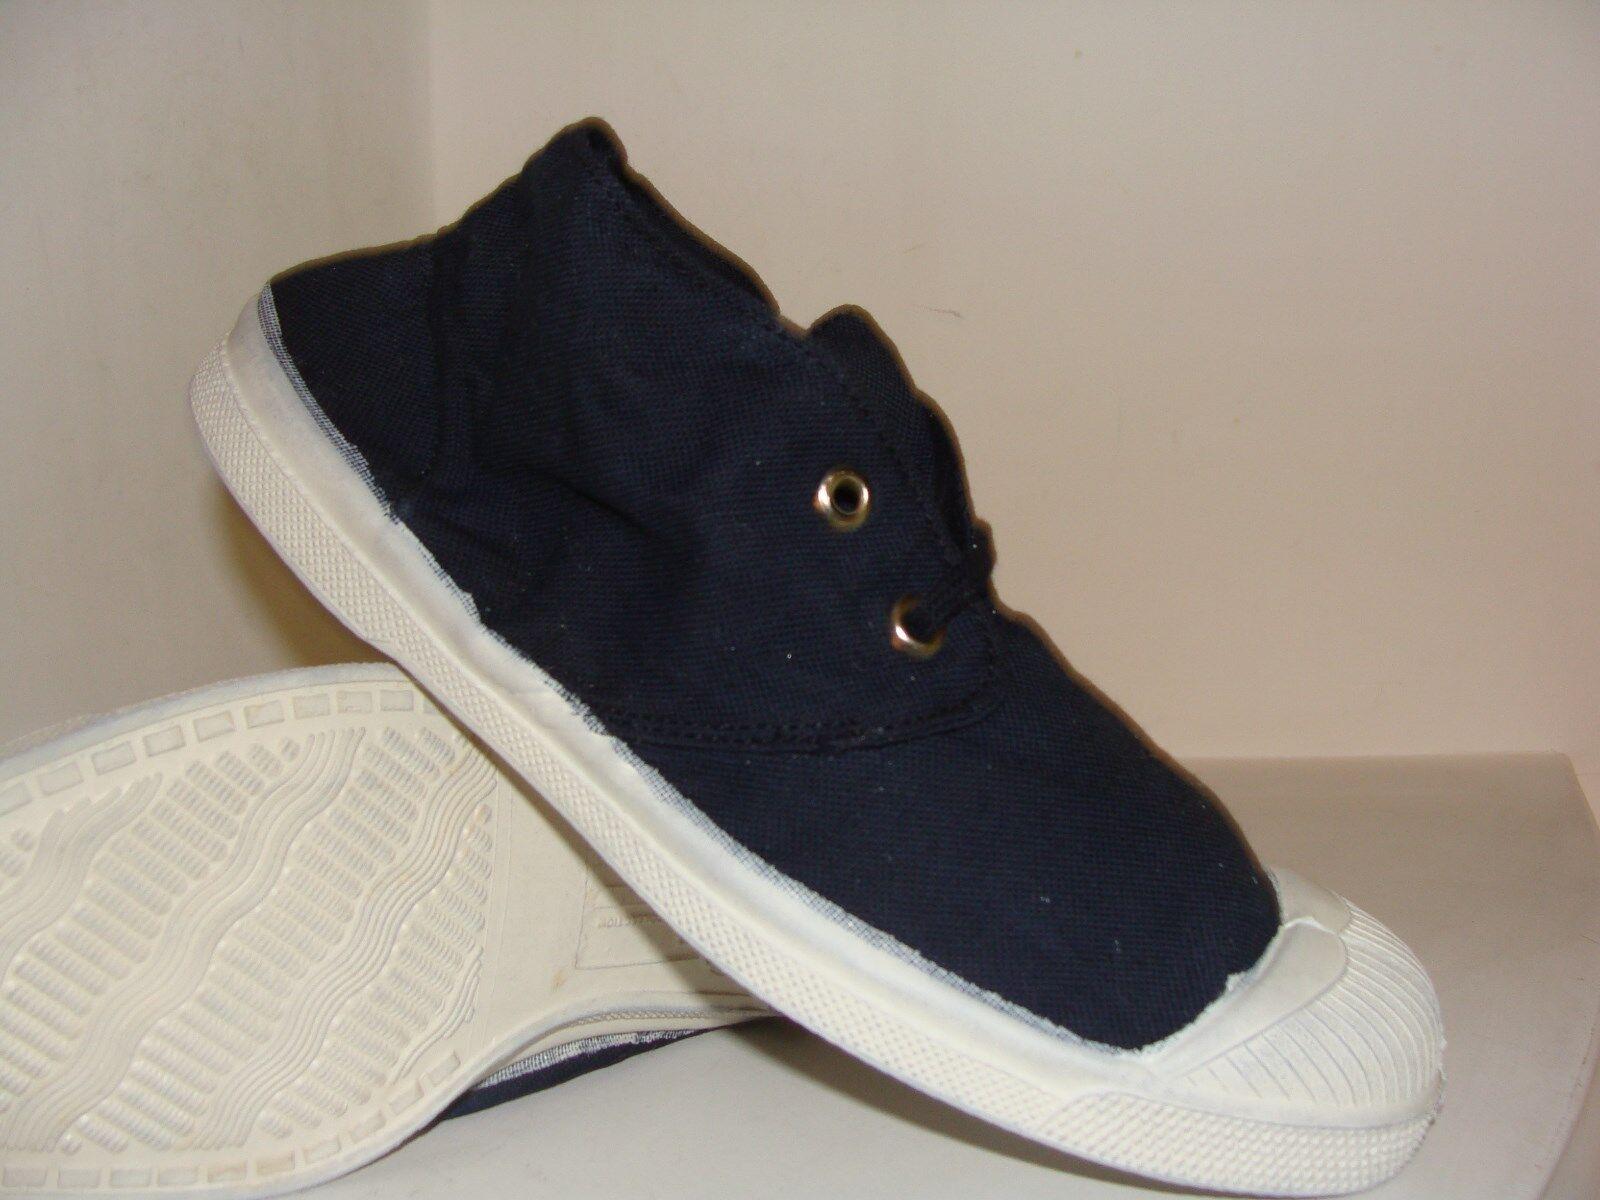 Bensimon Tennis shoes Navy Lace-Up Canvas